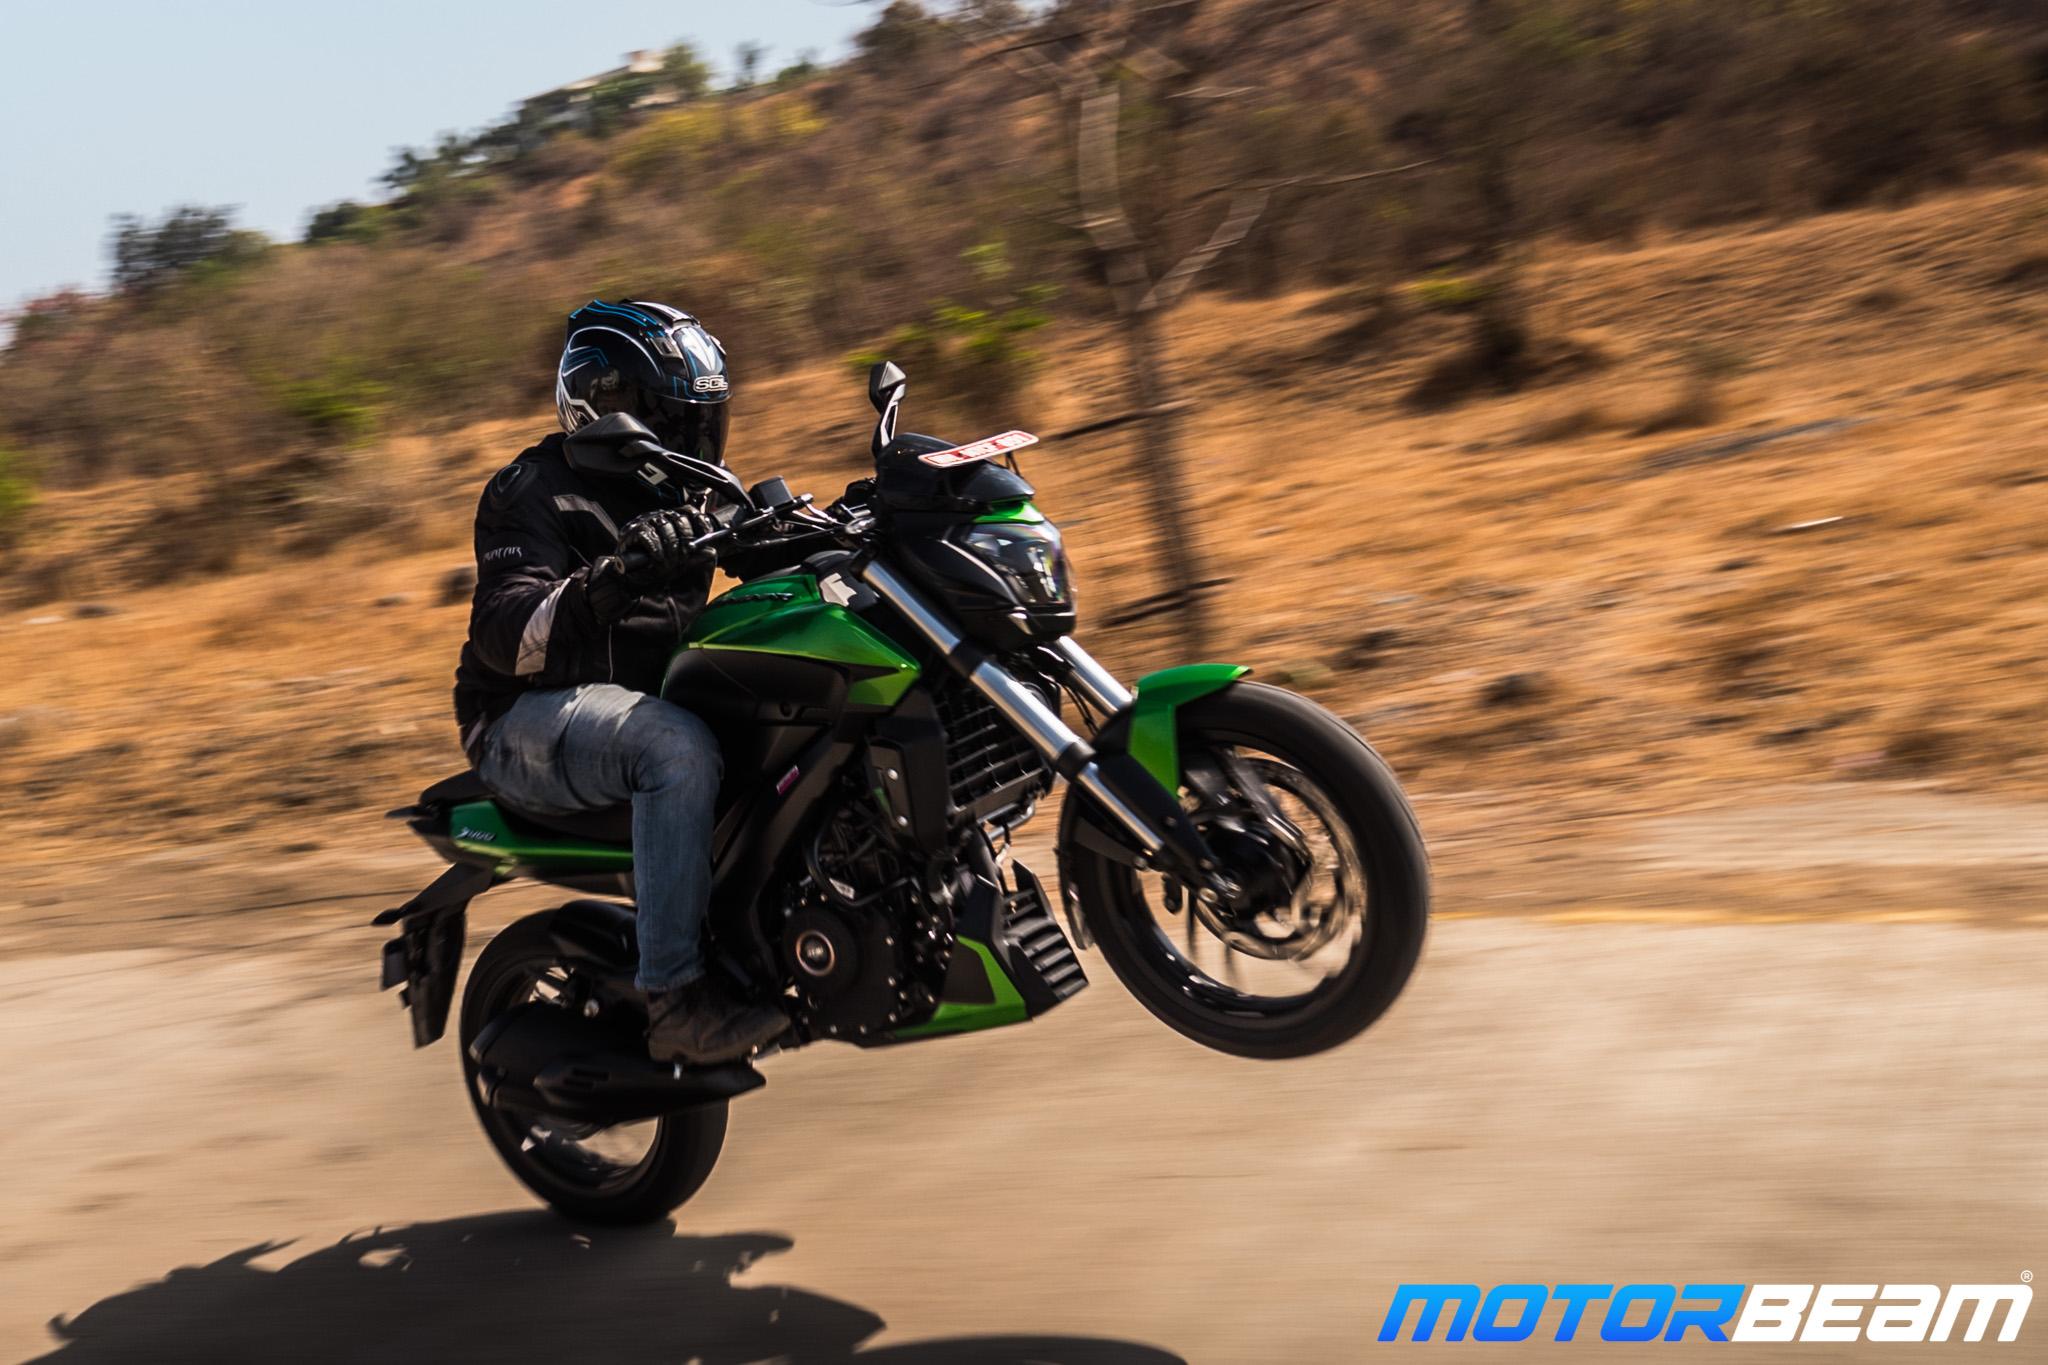 2019 Bajaj Dominar 400 Test Ride Review MotorBeam 2048x1365